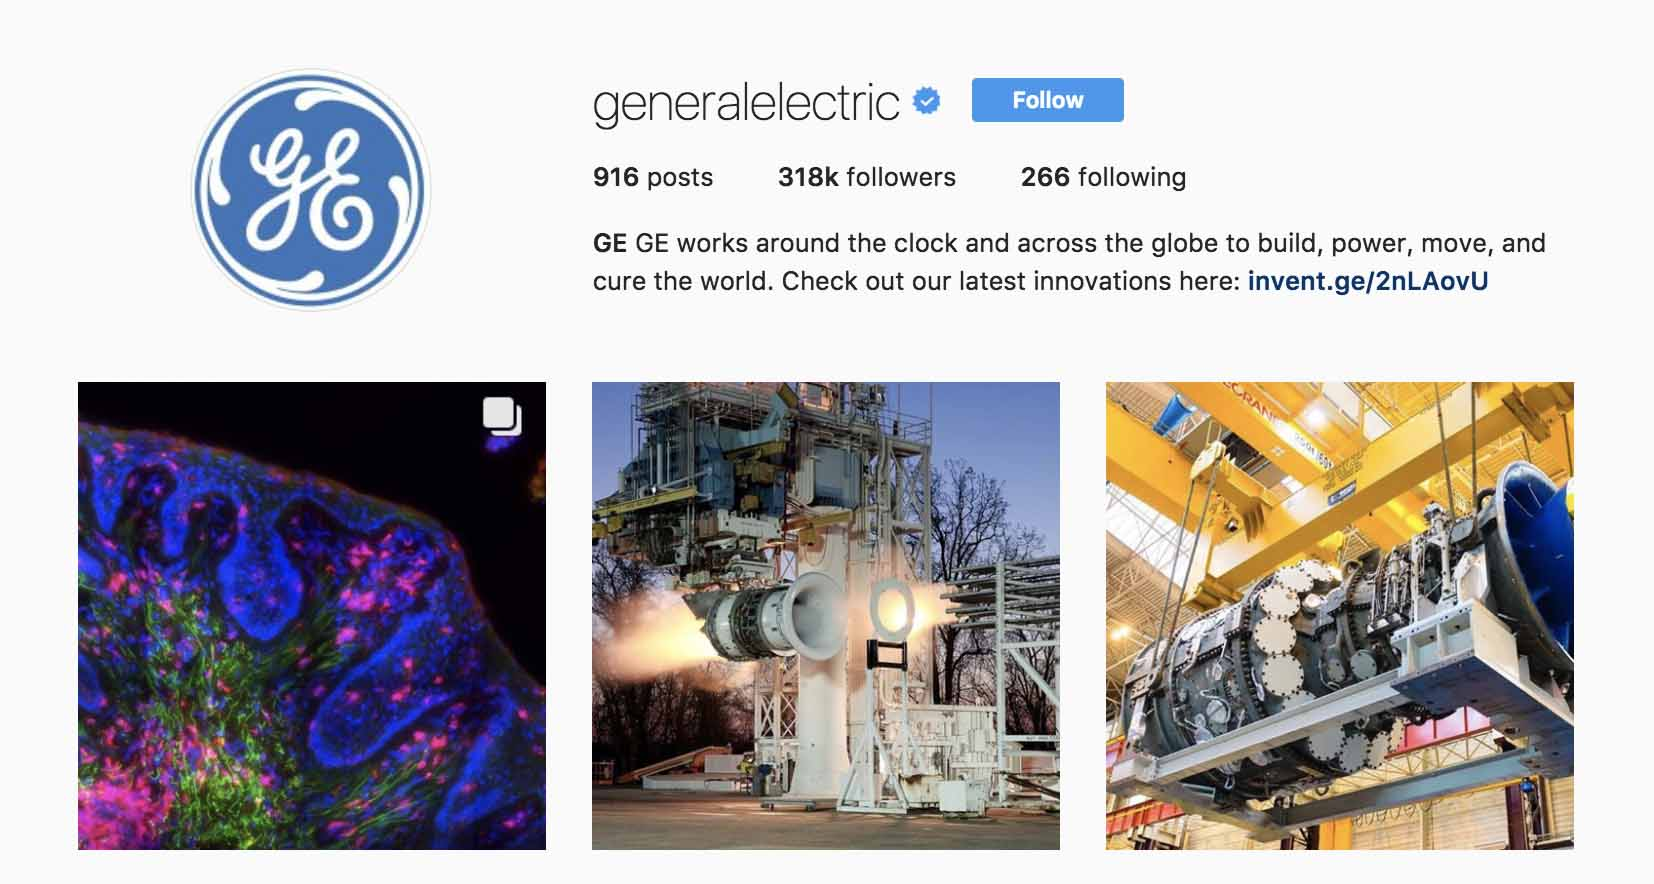 instagram-bio-ideas-generalelectric